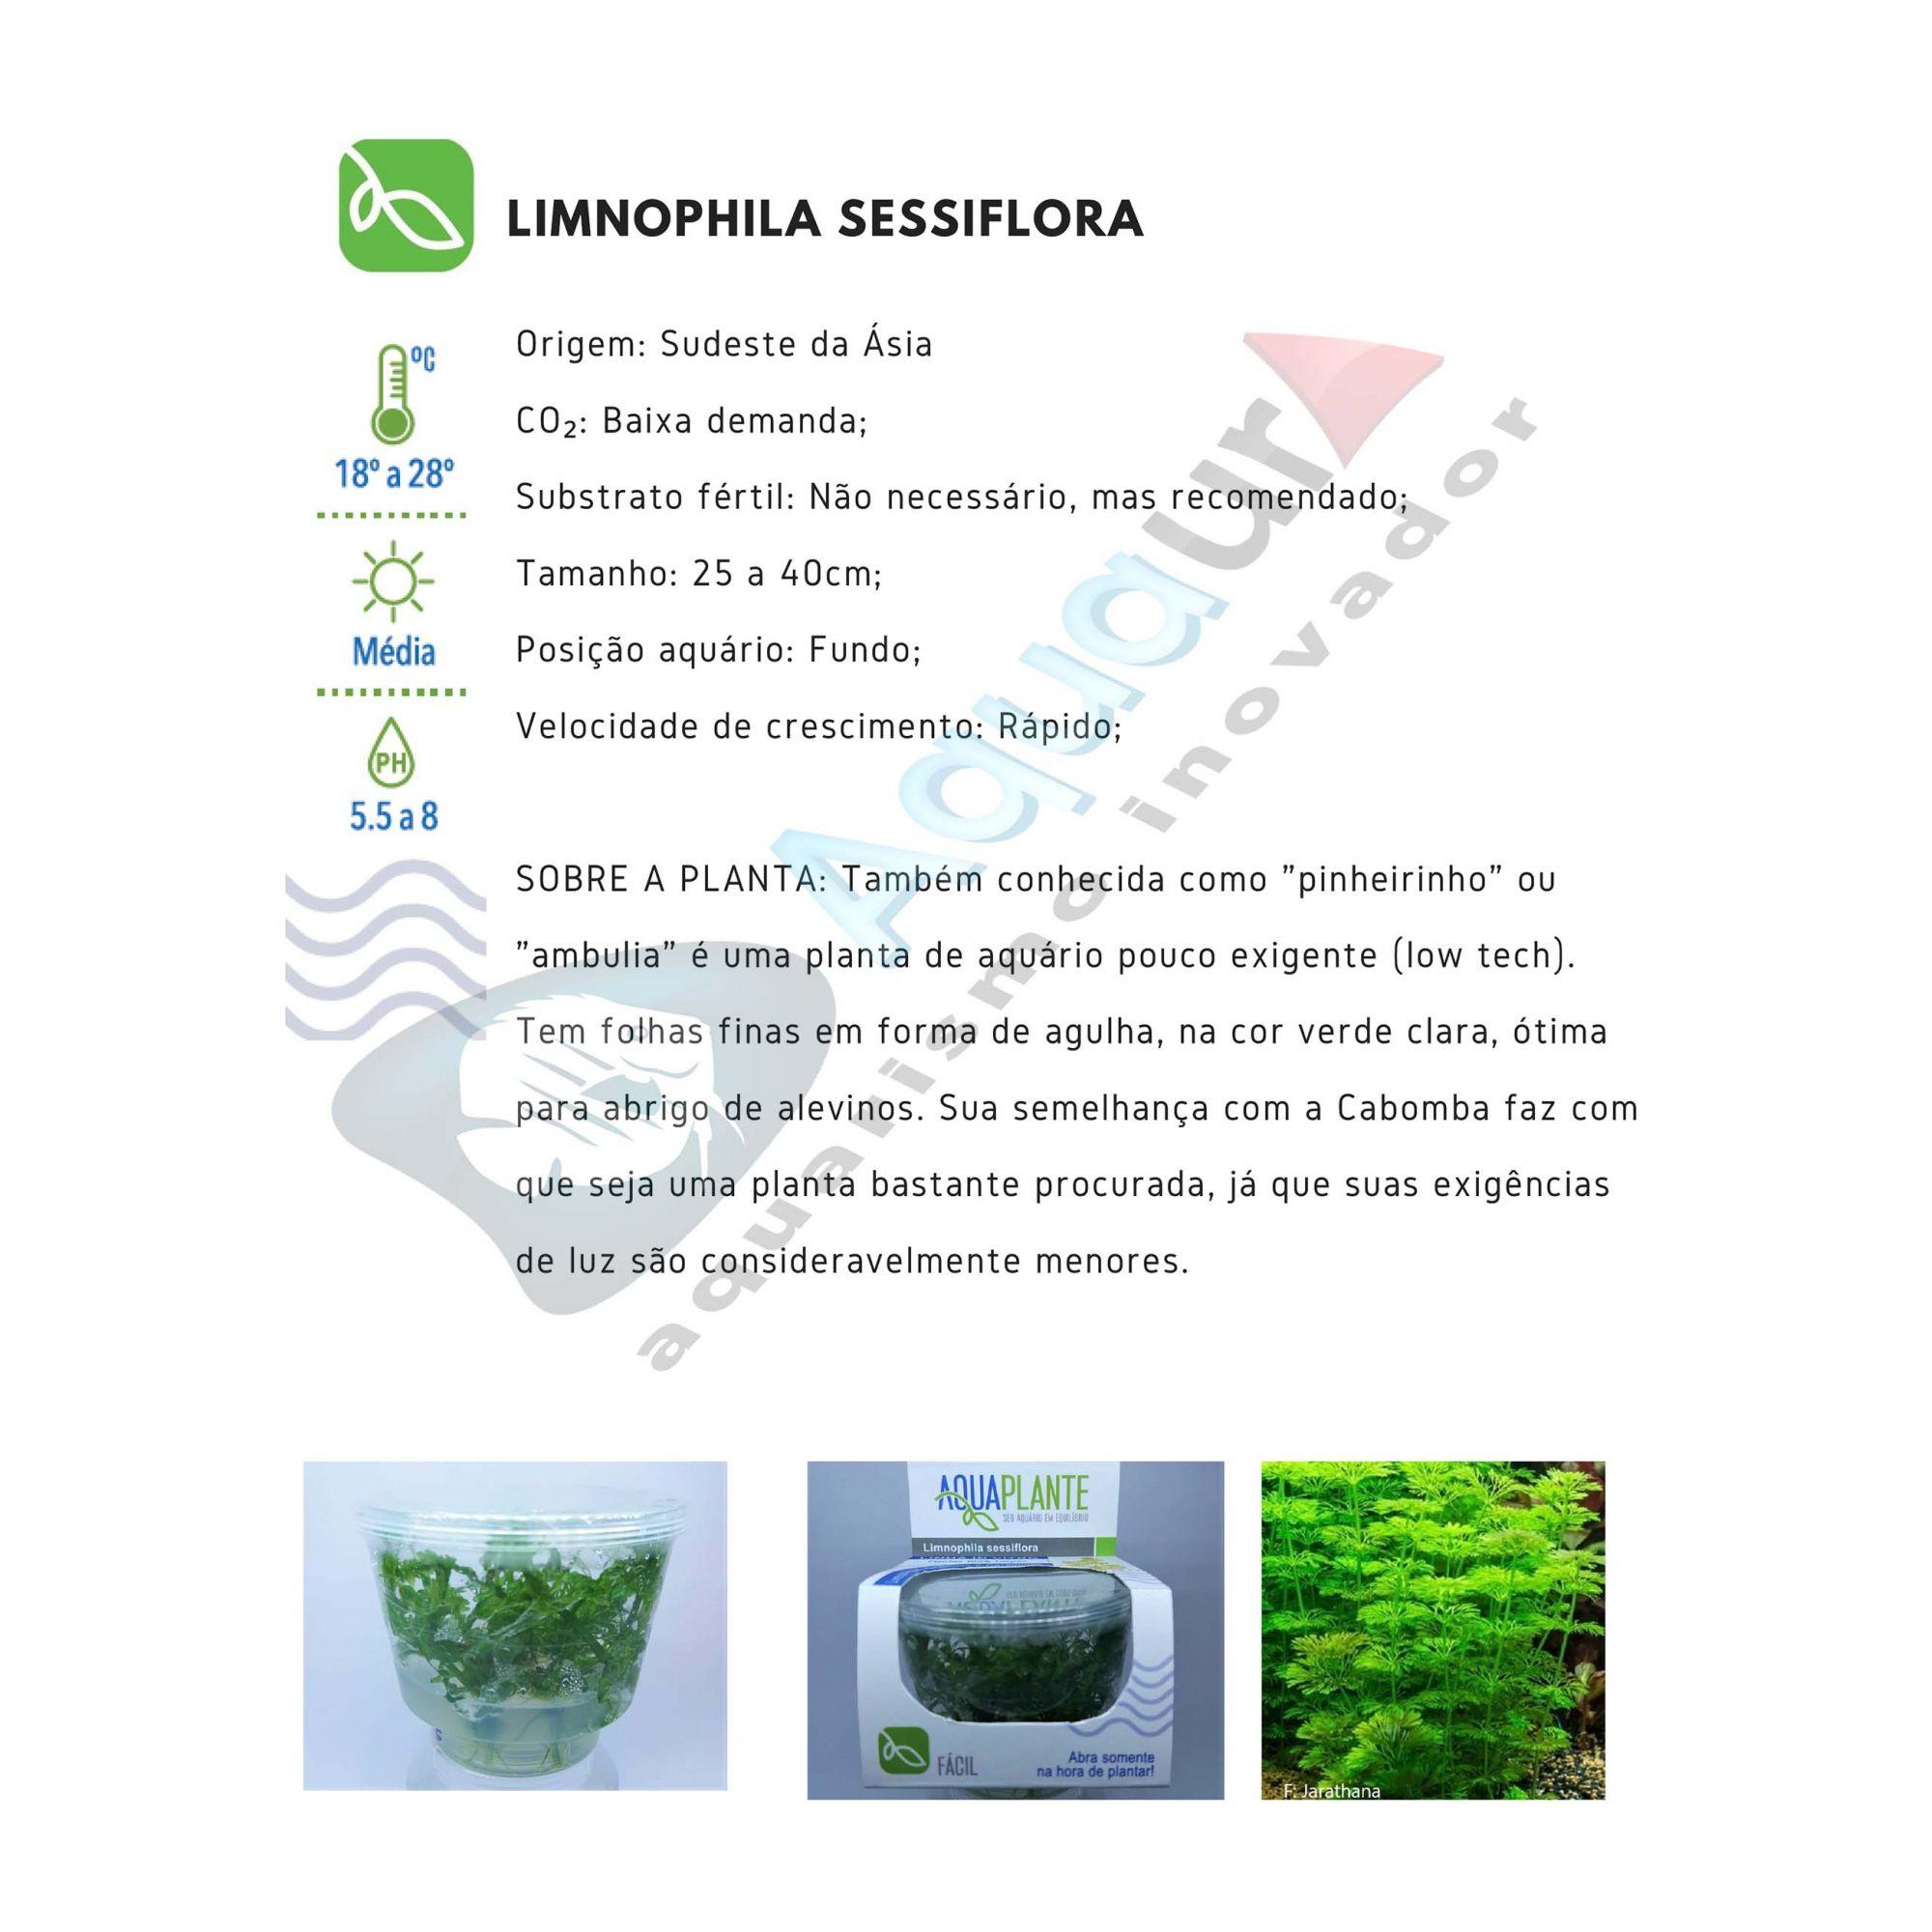 PLANTA NATURAL LIMNOPHILA SESSILIFLORA - AQUAPLANTE